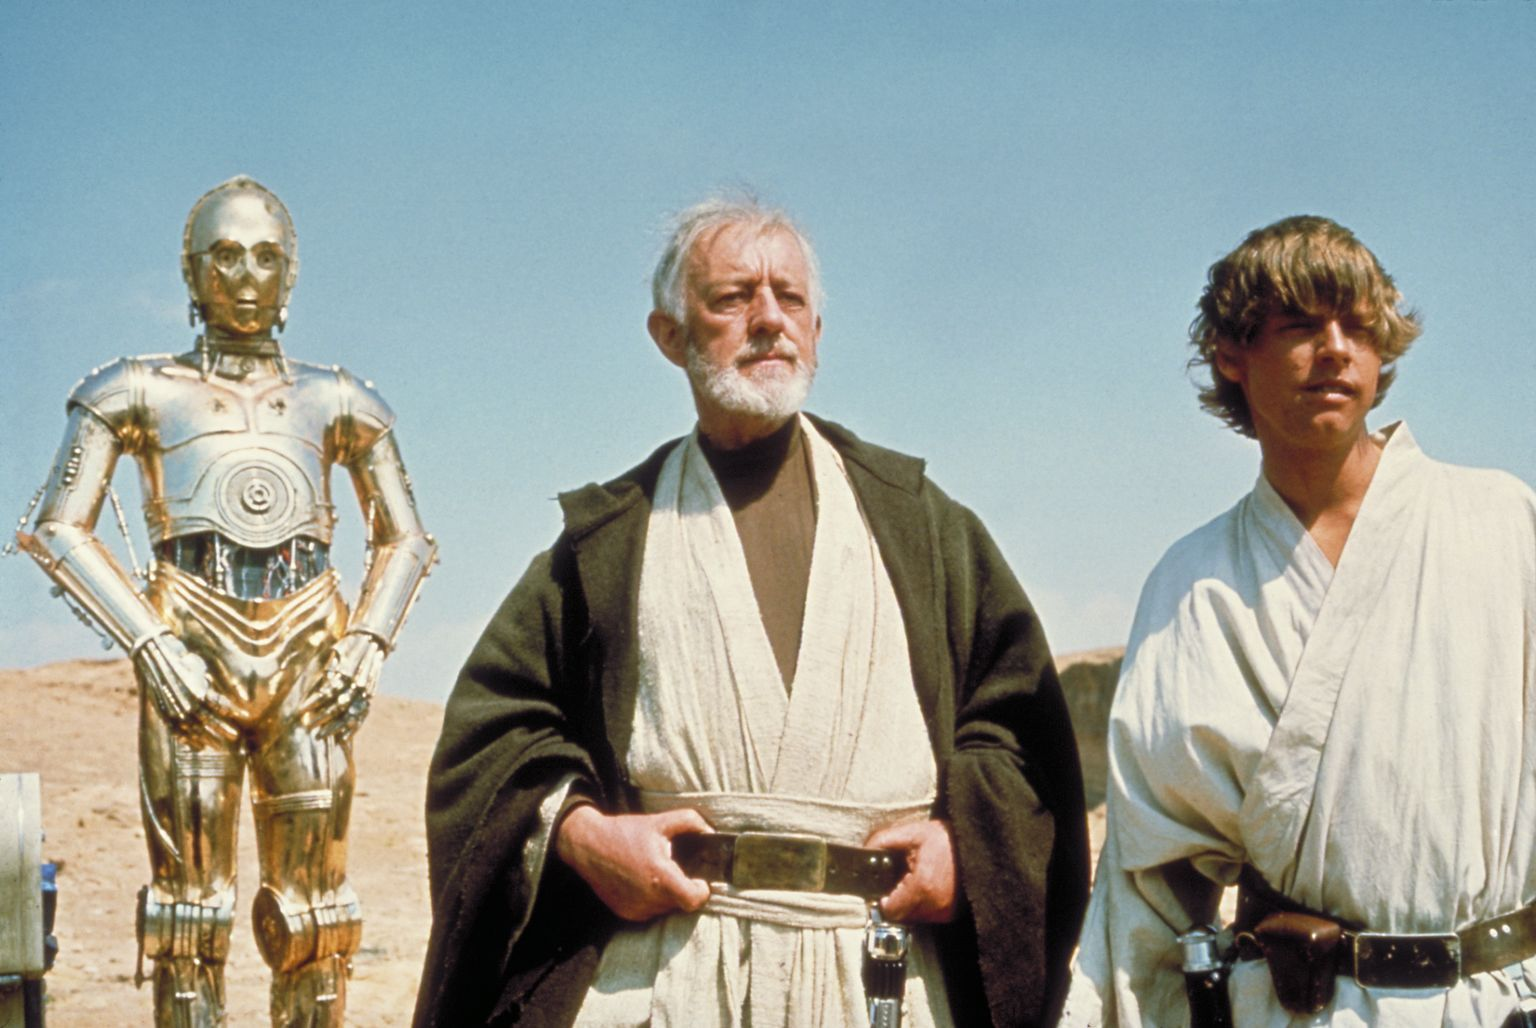 Still of Alec Guinness and Mark Hamill in Zvaigzdziu karai (1977)